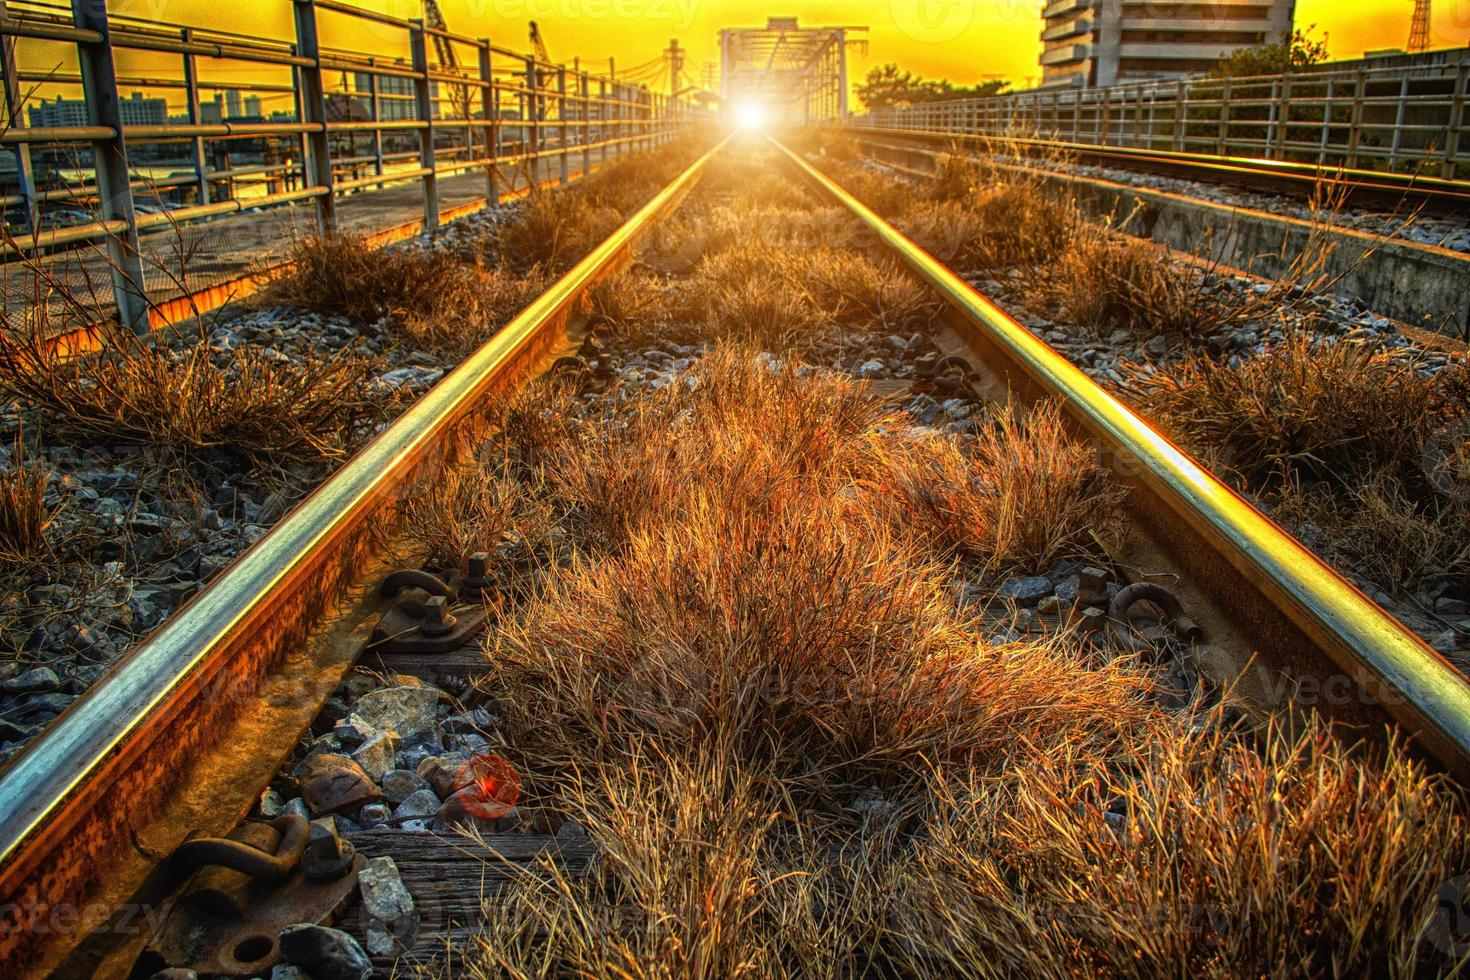 The Railroad photo